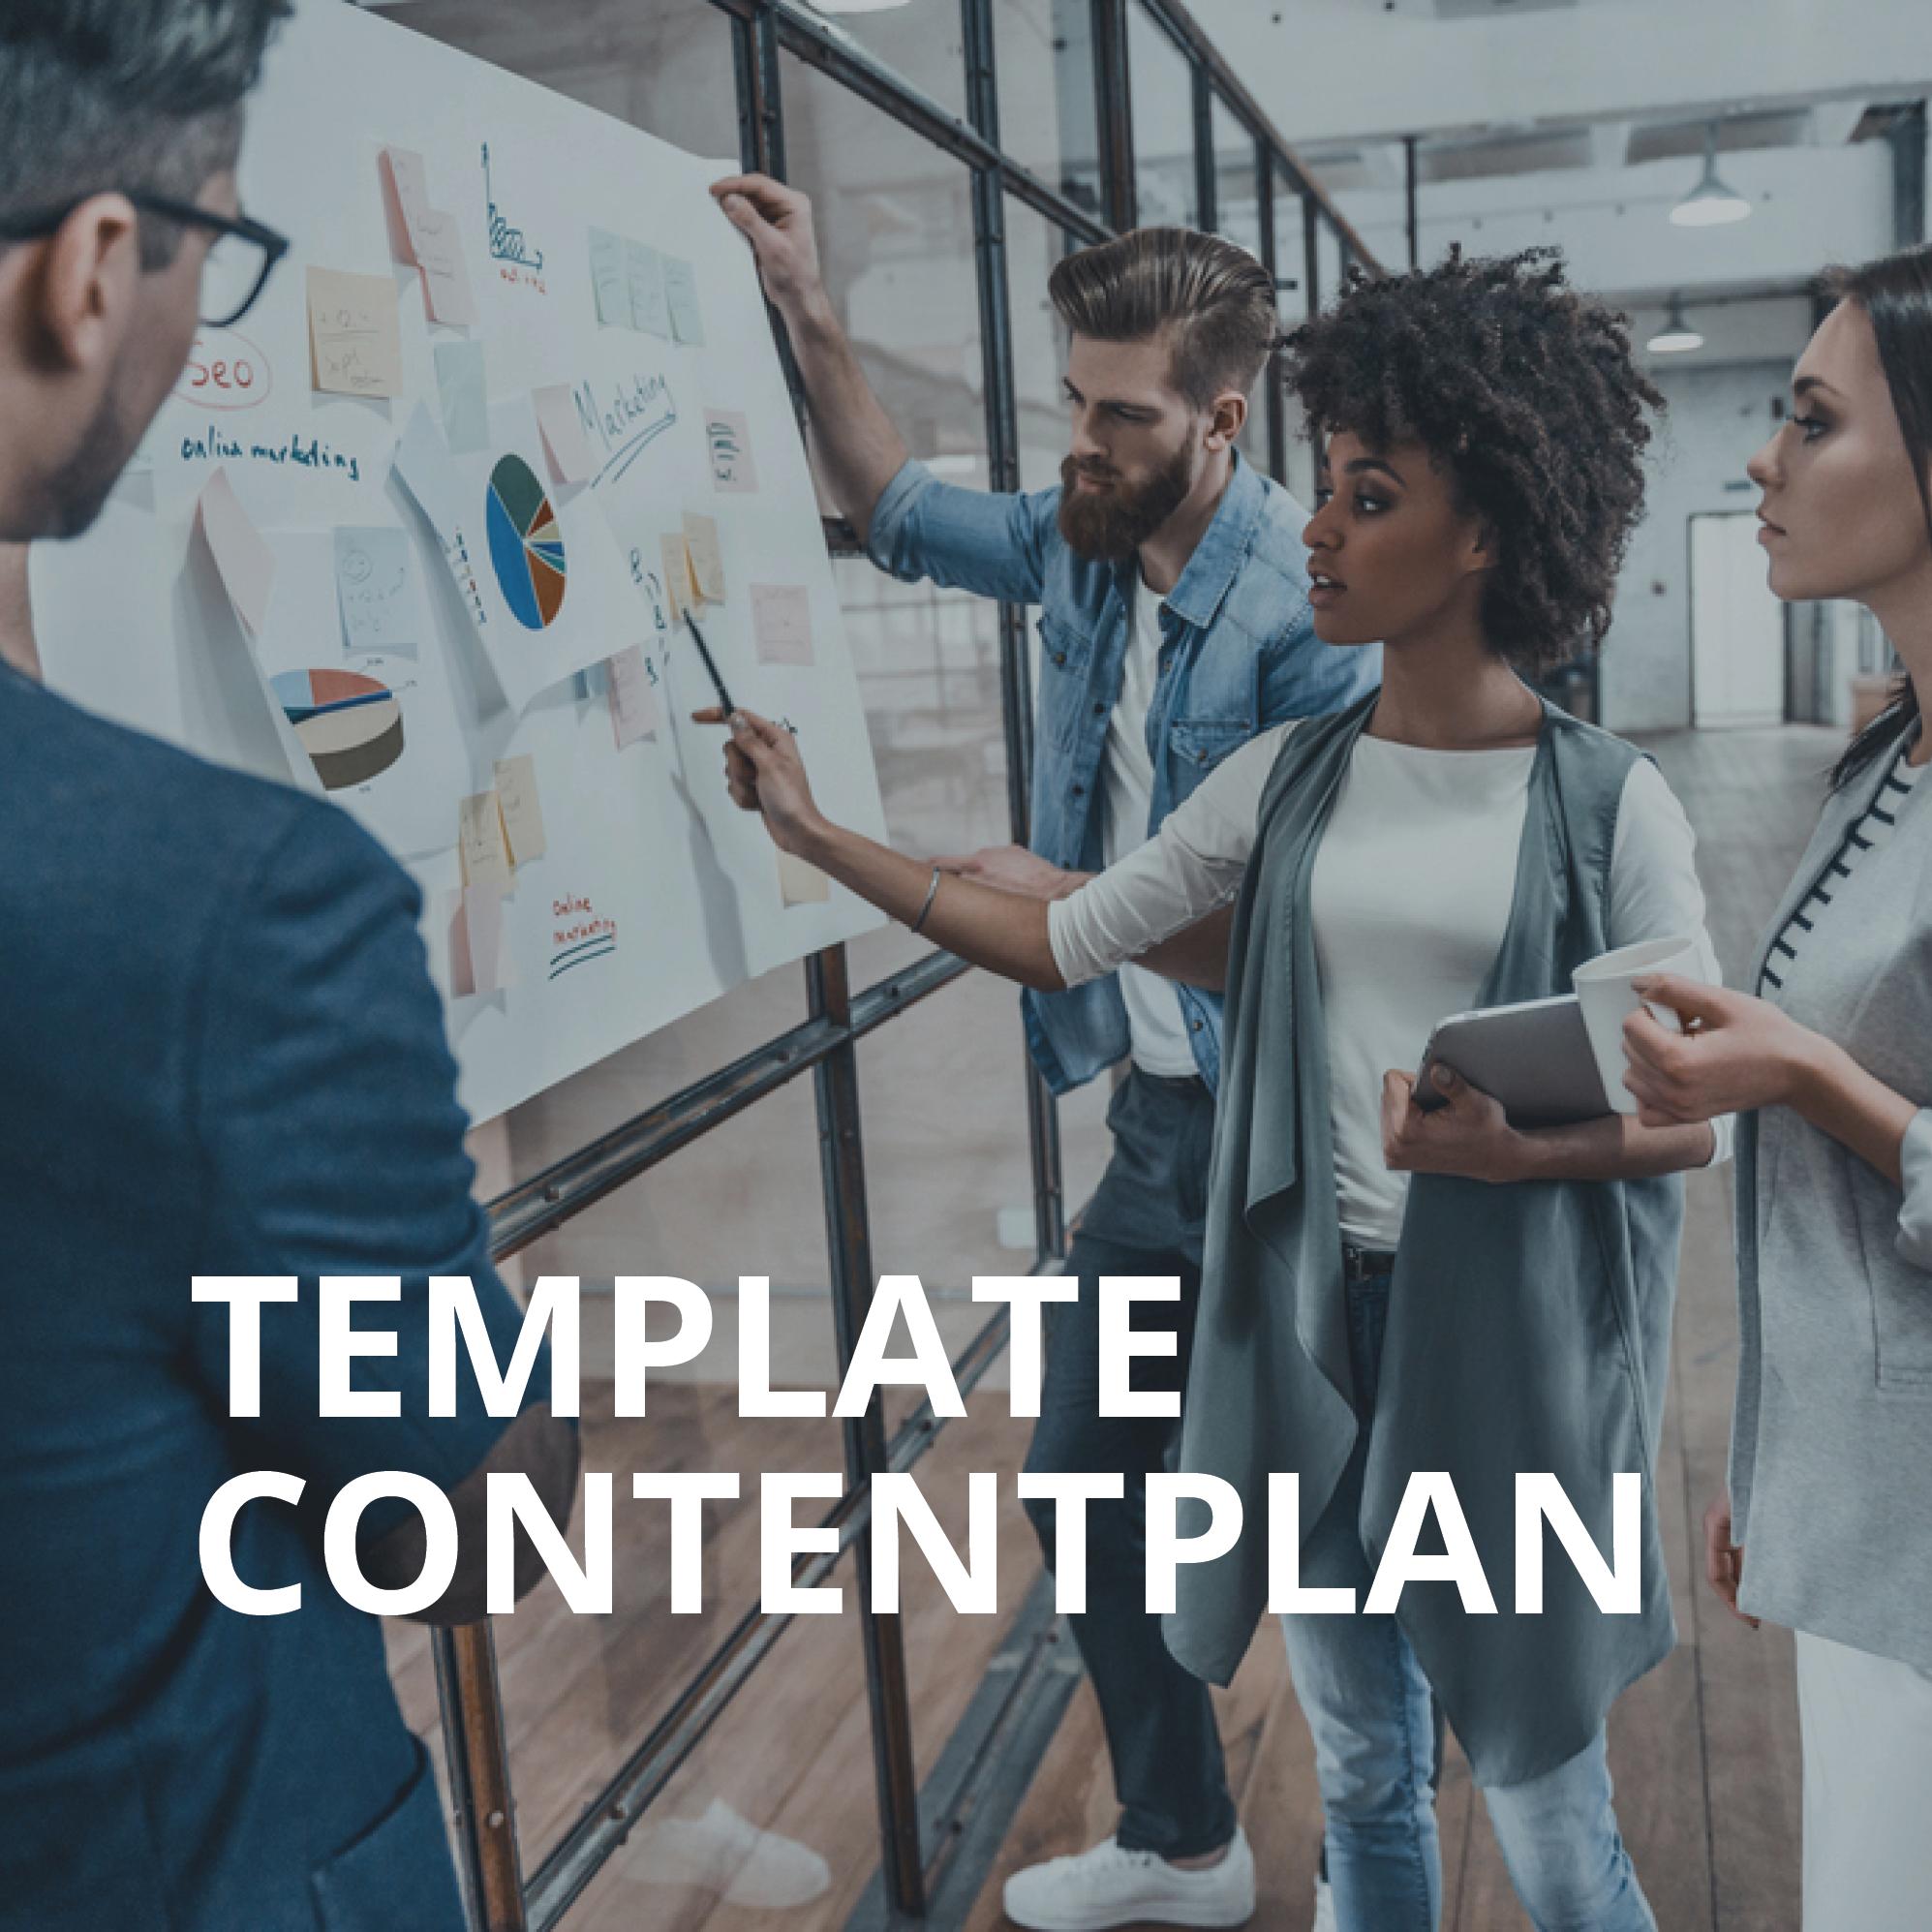 Template Contentplan